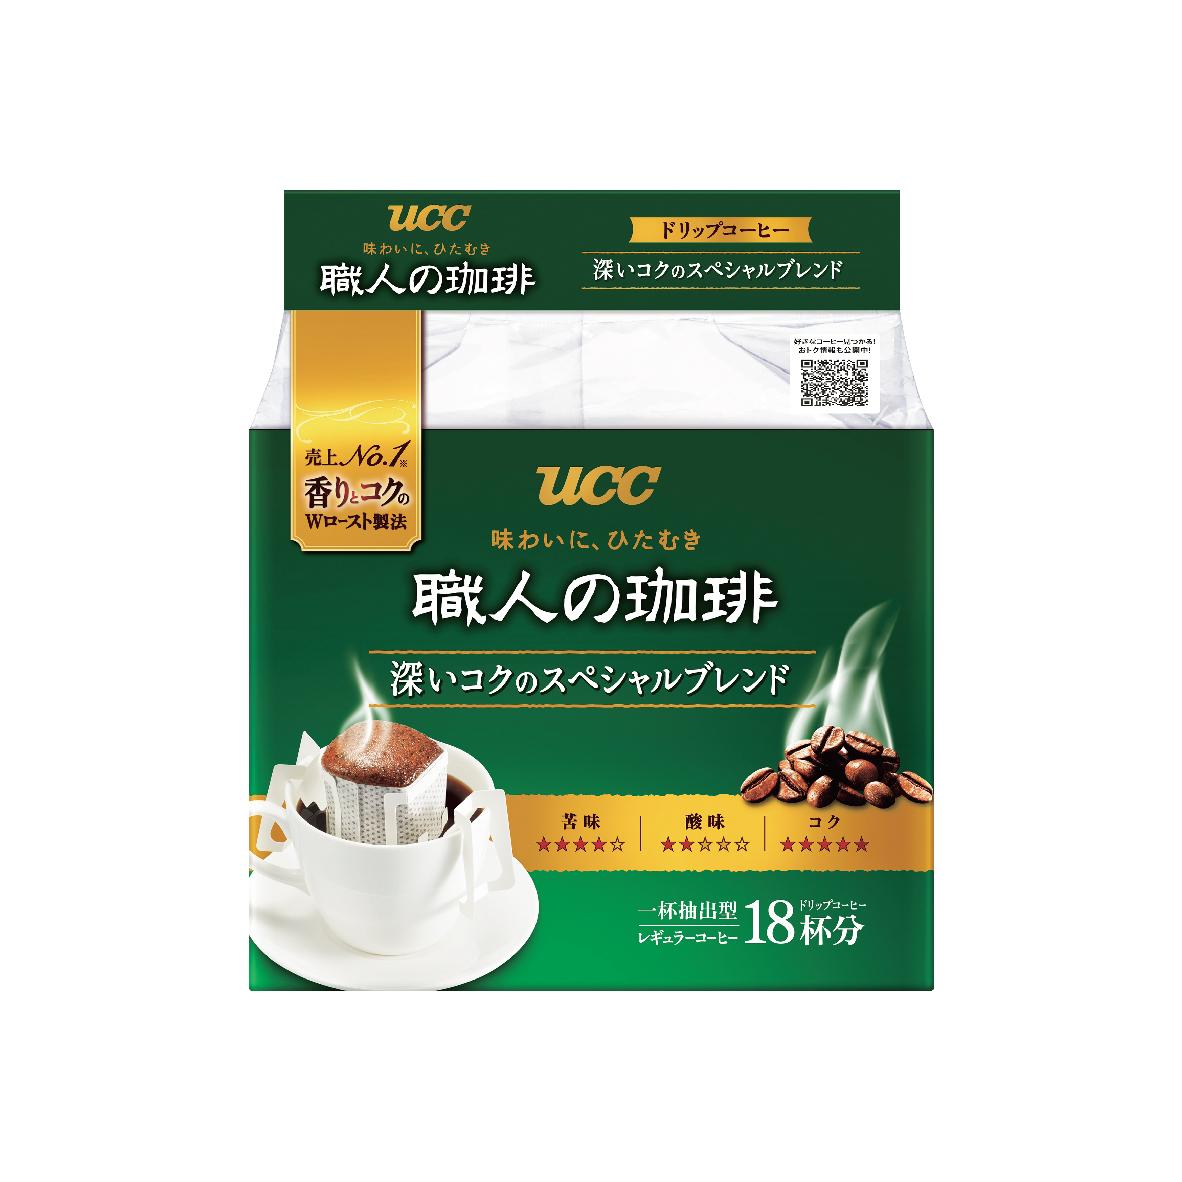 UCC Craftsman's Coffee Rich Drip Coffee